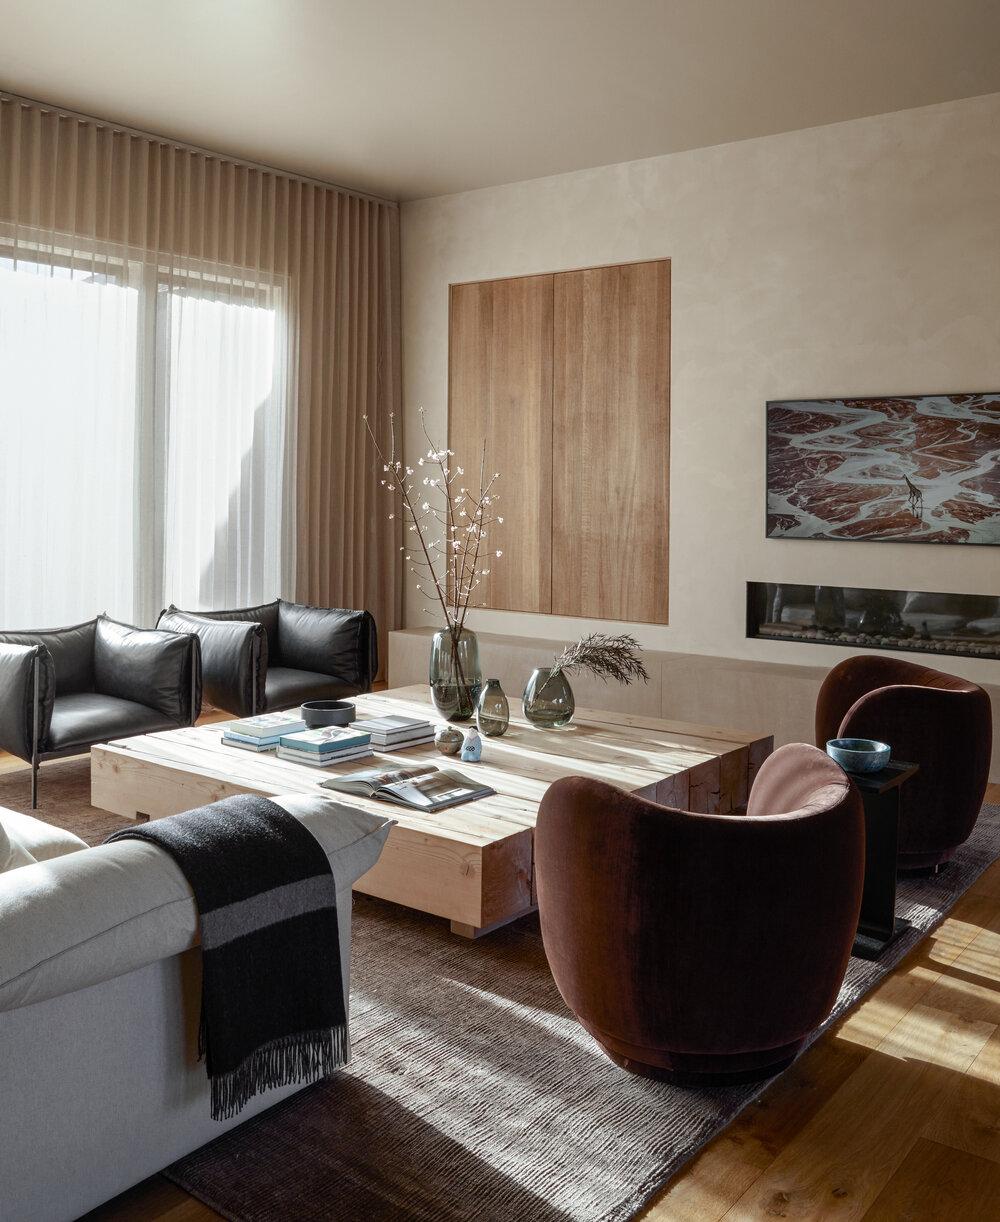 LO House by Kaemingk Design